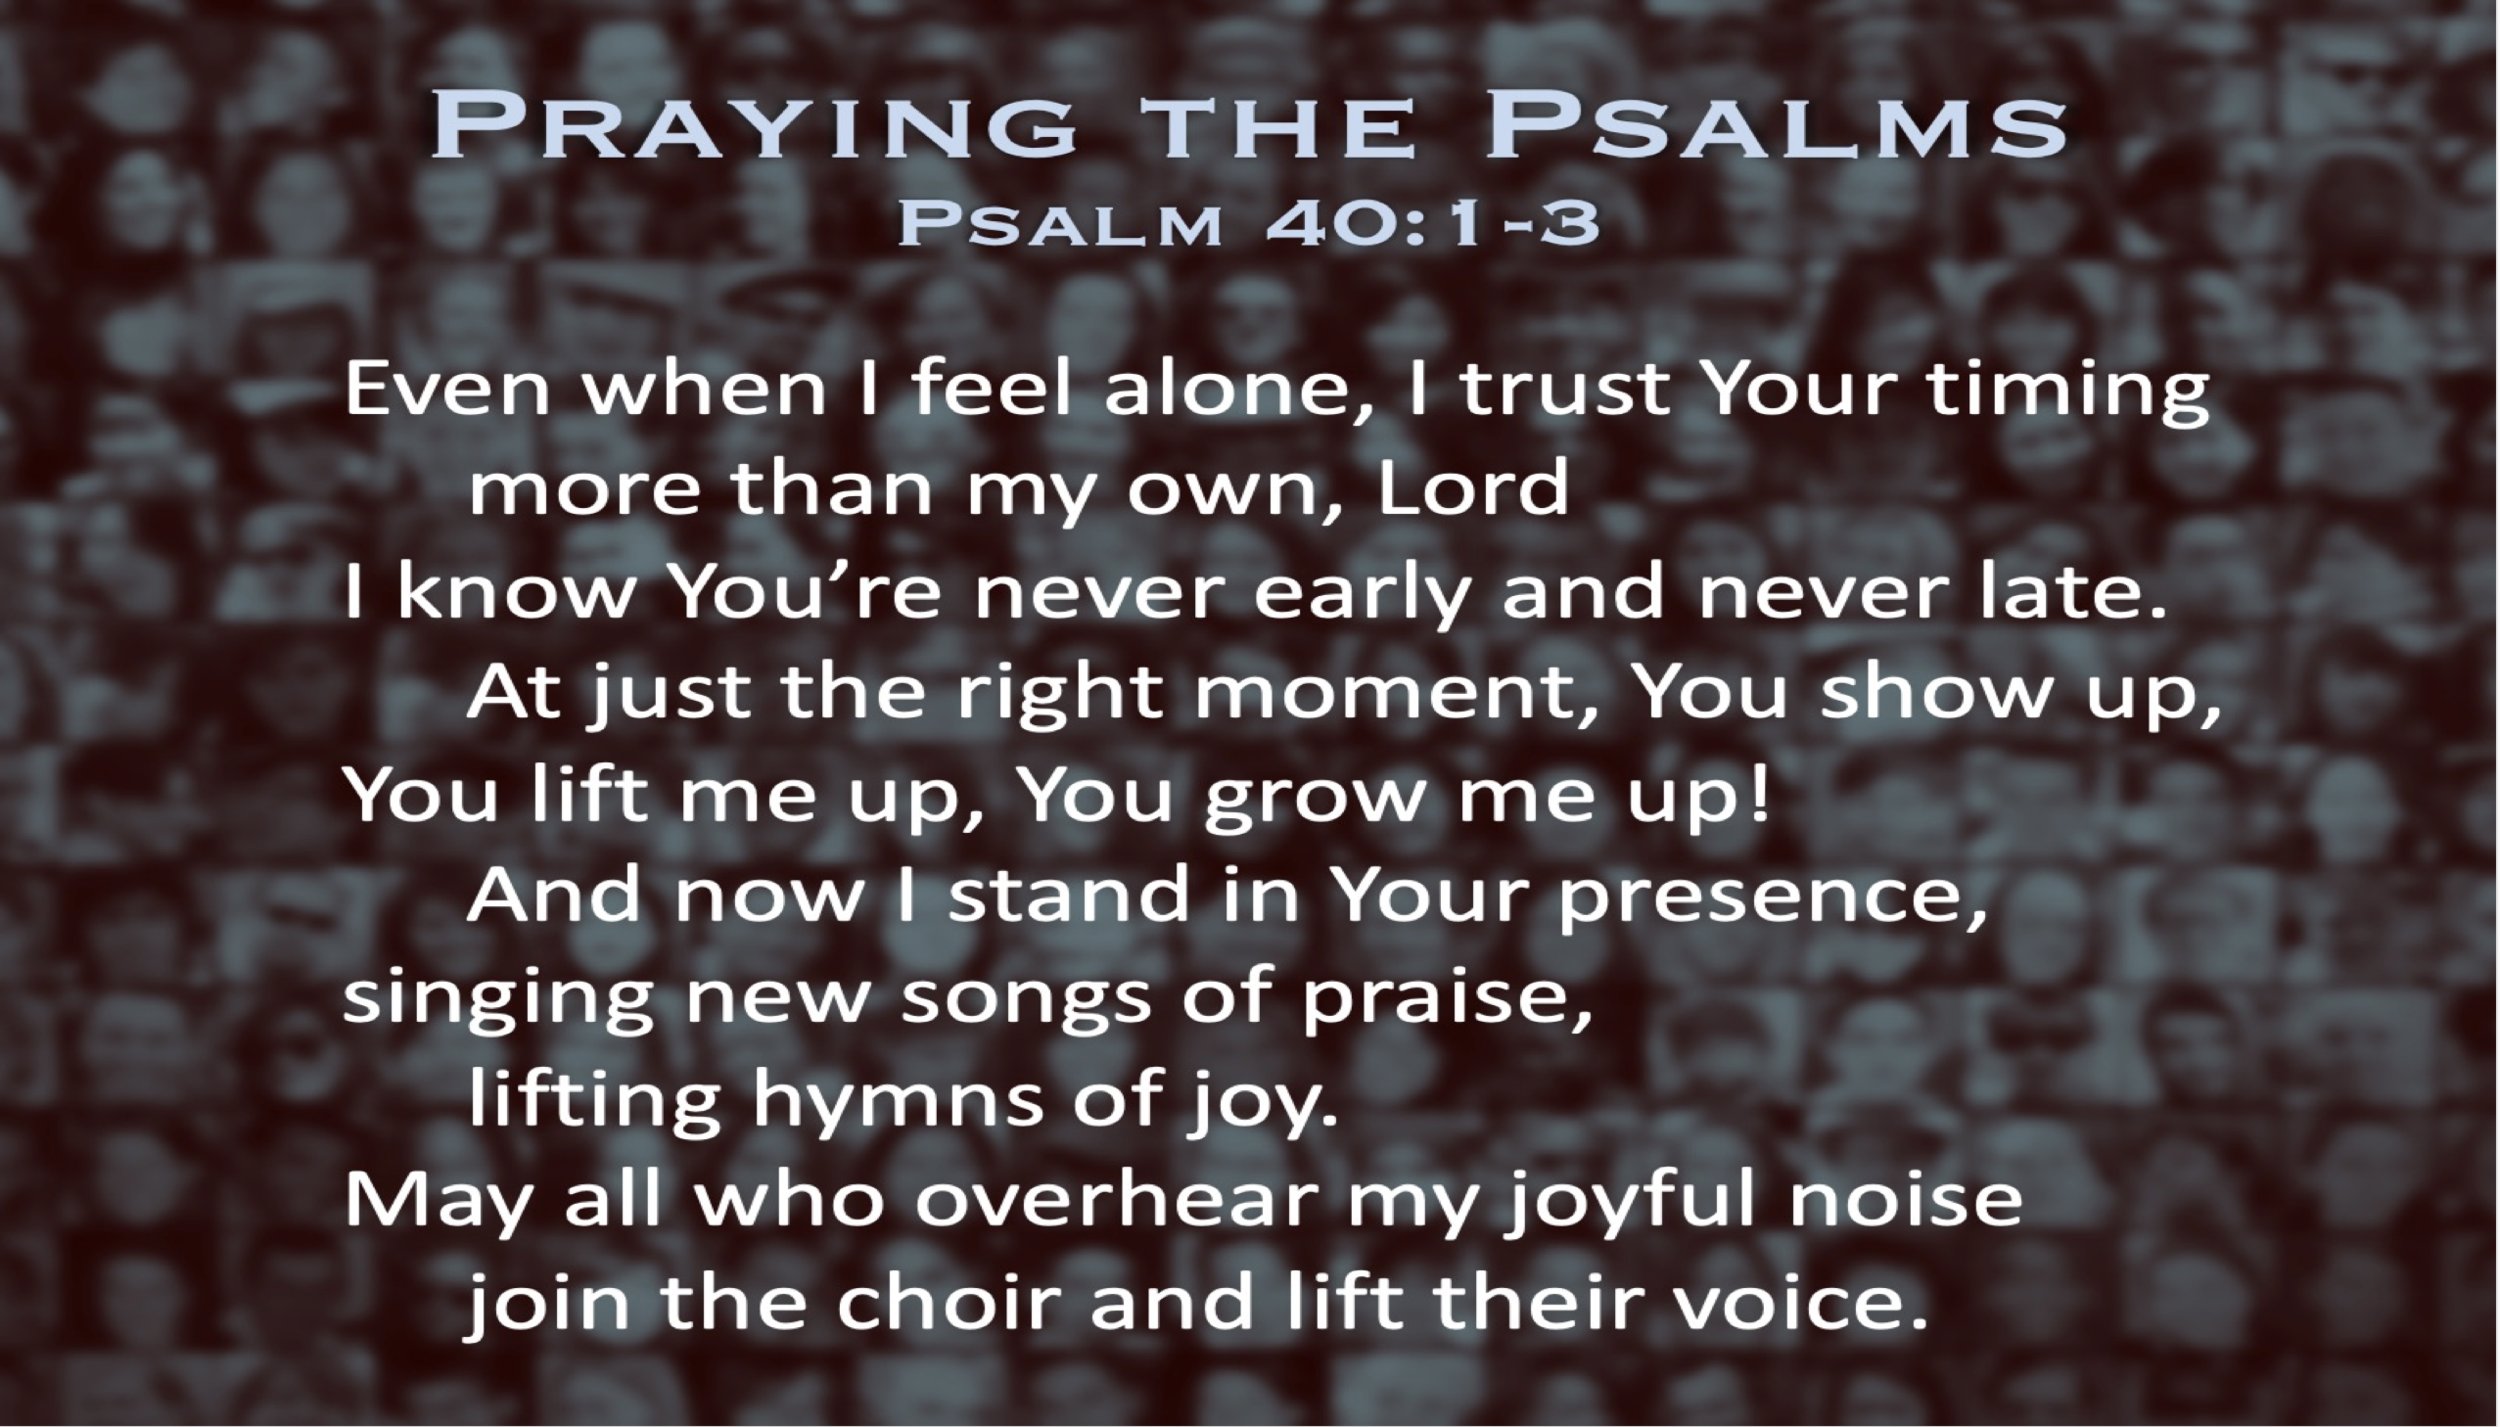 Psalm 40 pt. 2 (Prayer)